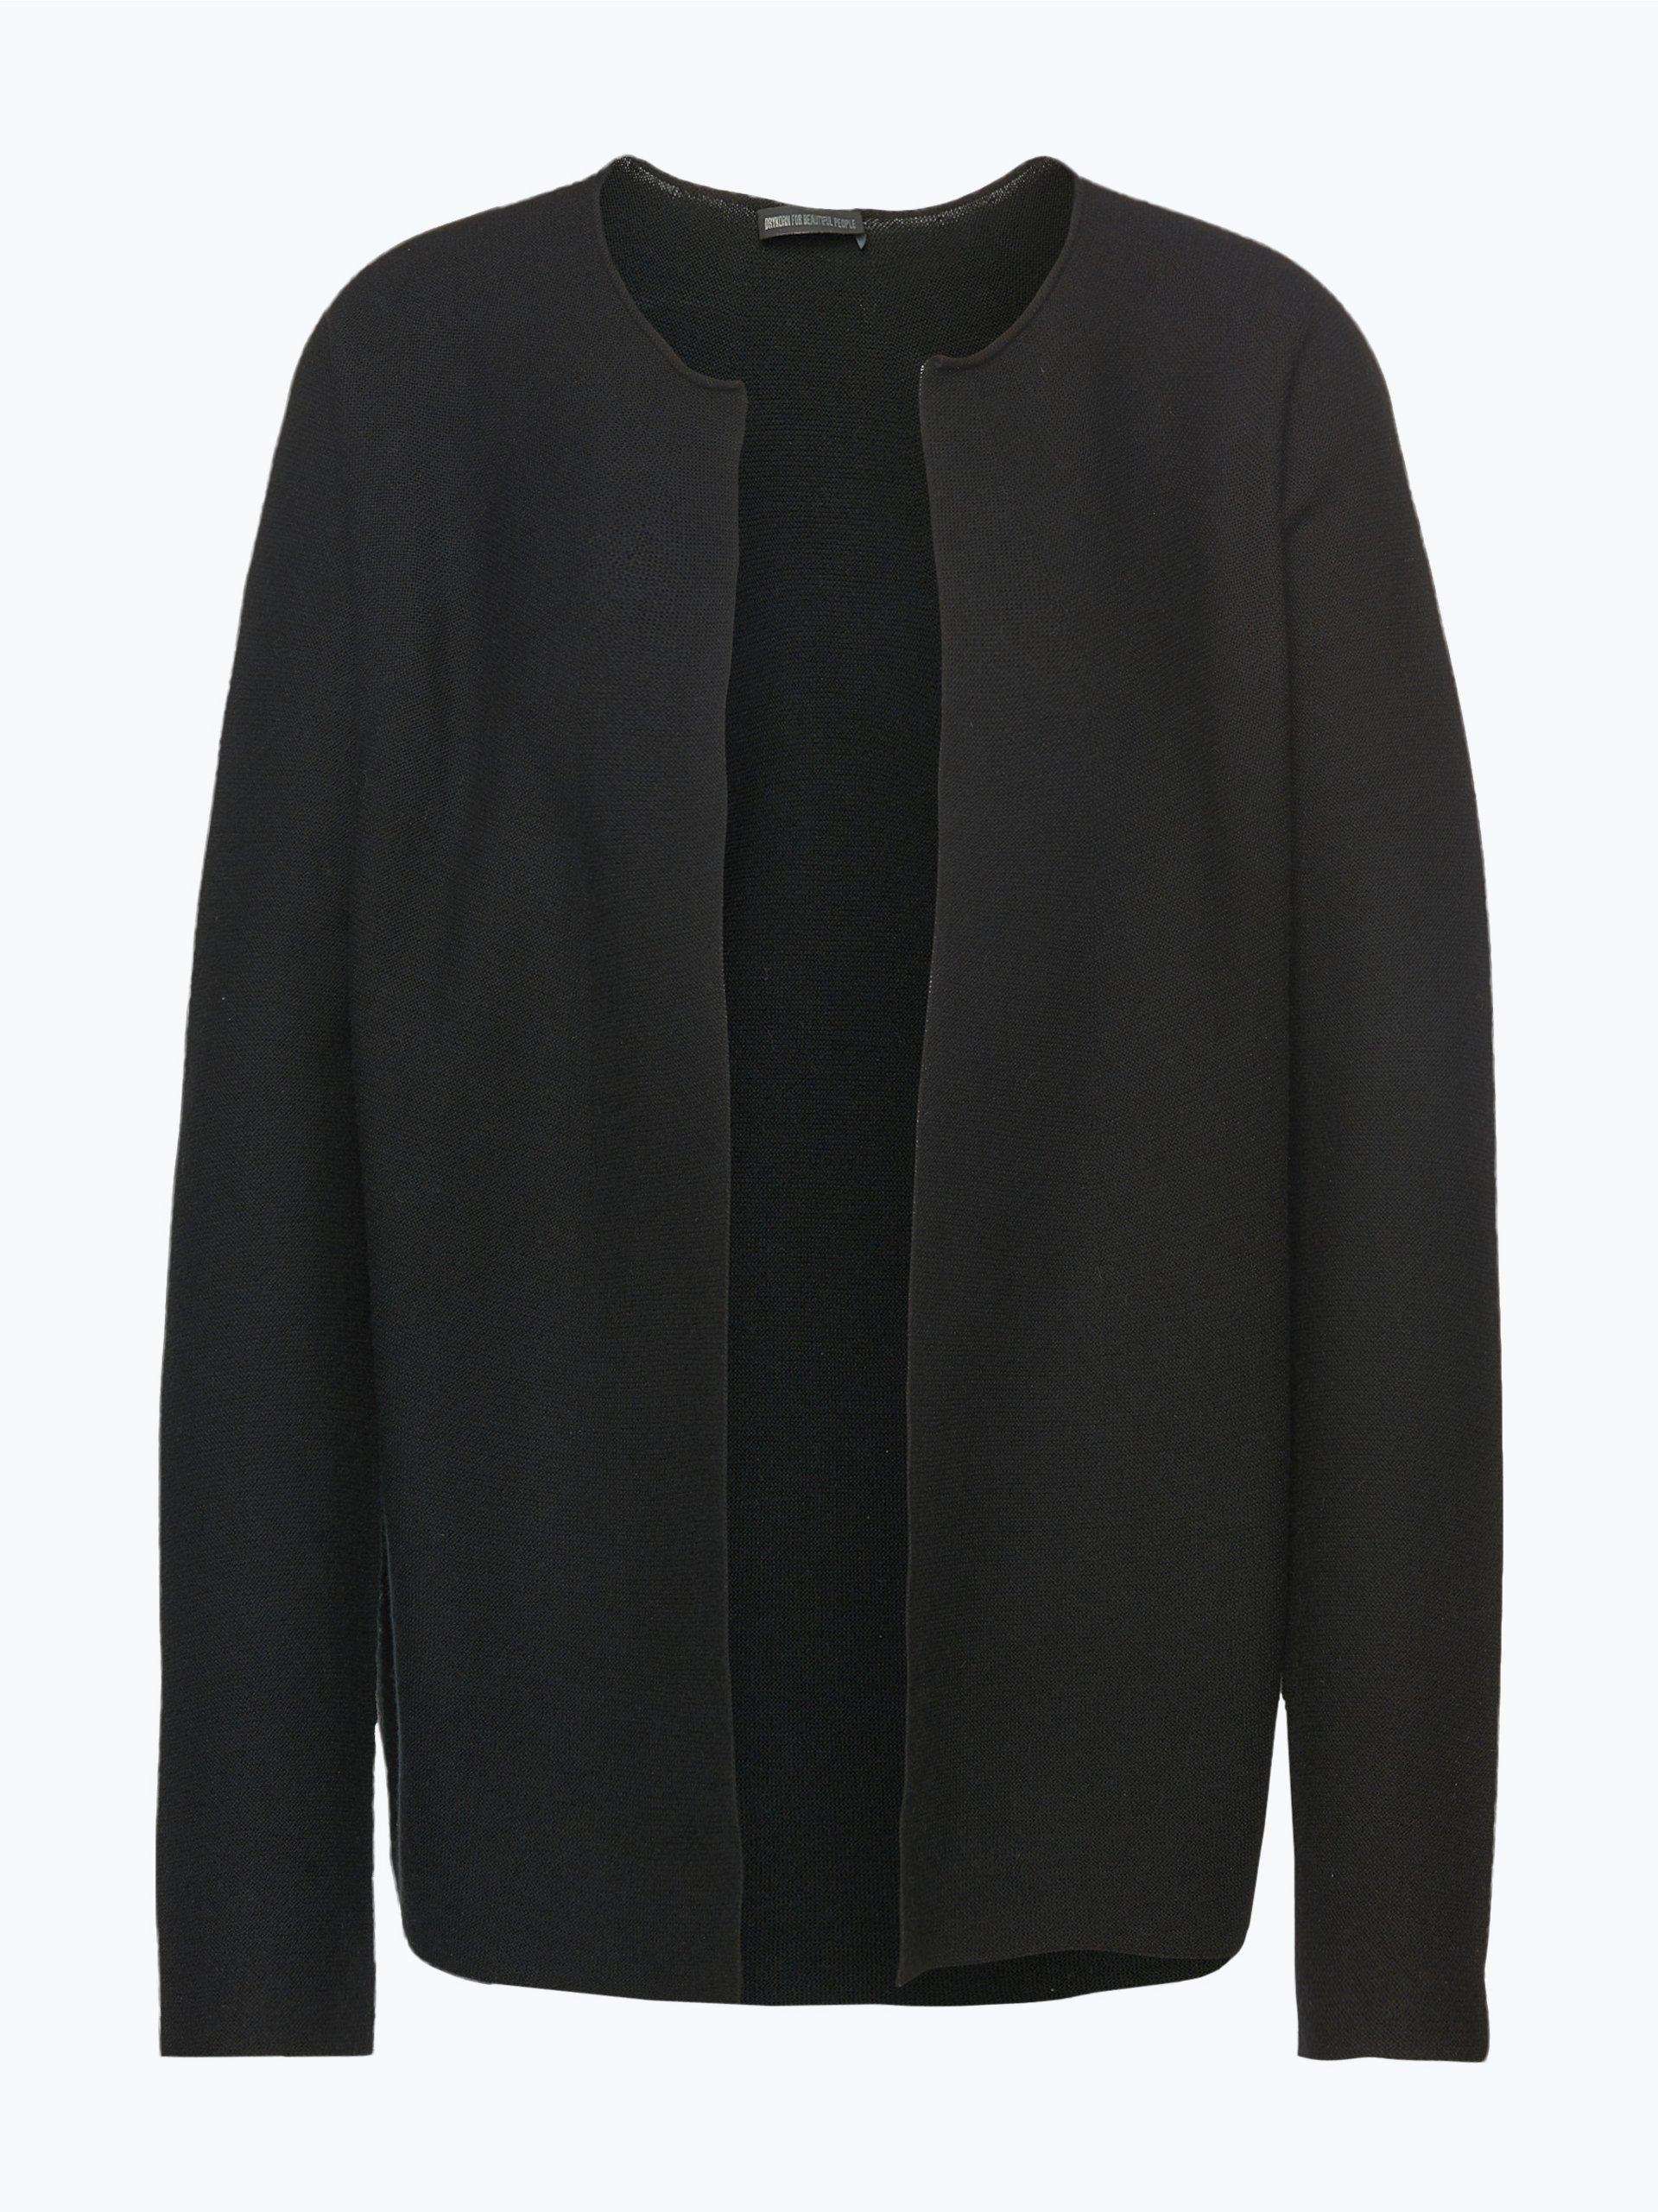 drykorn damen strickjacke mit cashmere anteil kibi schwarz uni online kaufen vangraaf com. Black Bedroom Furniture Sets. Home Design Ideas